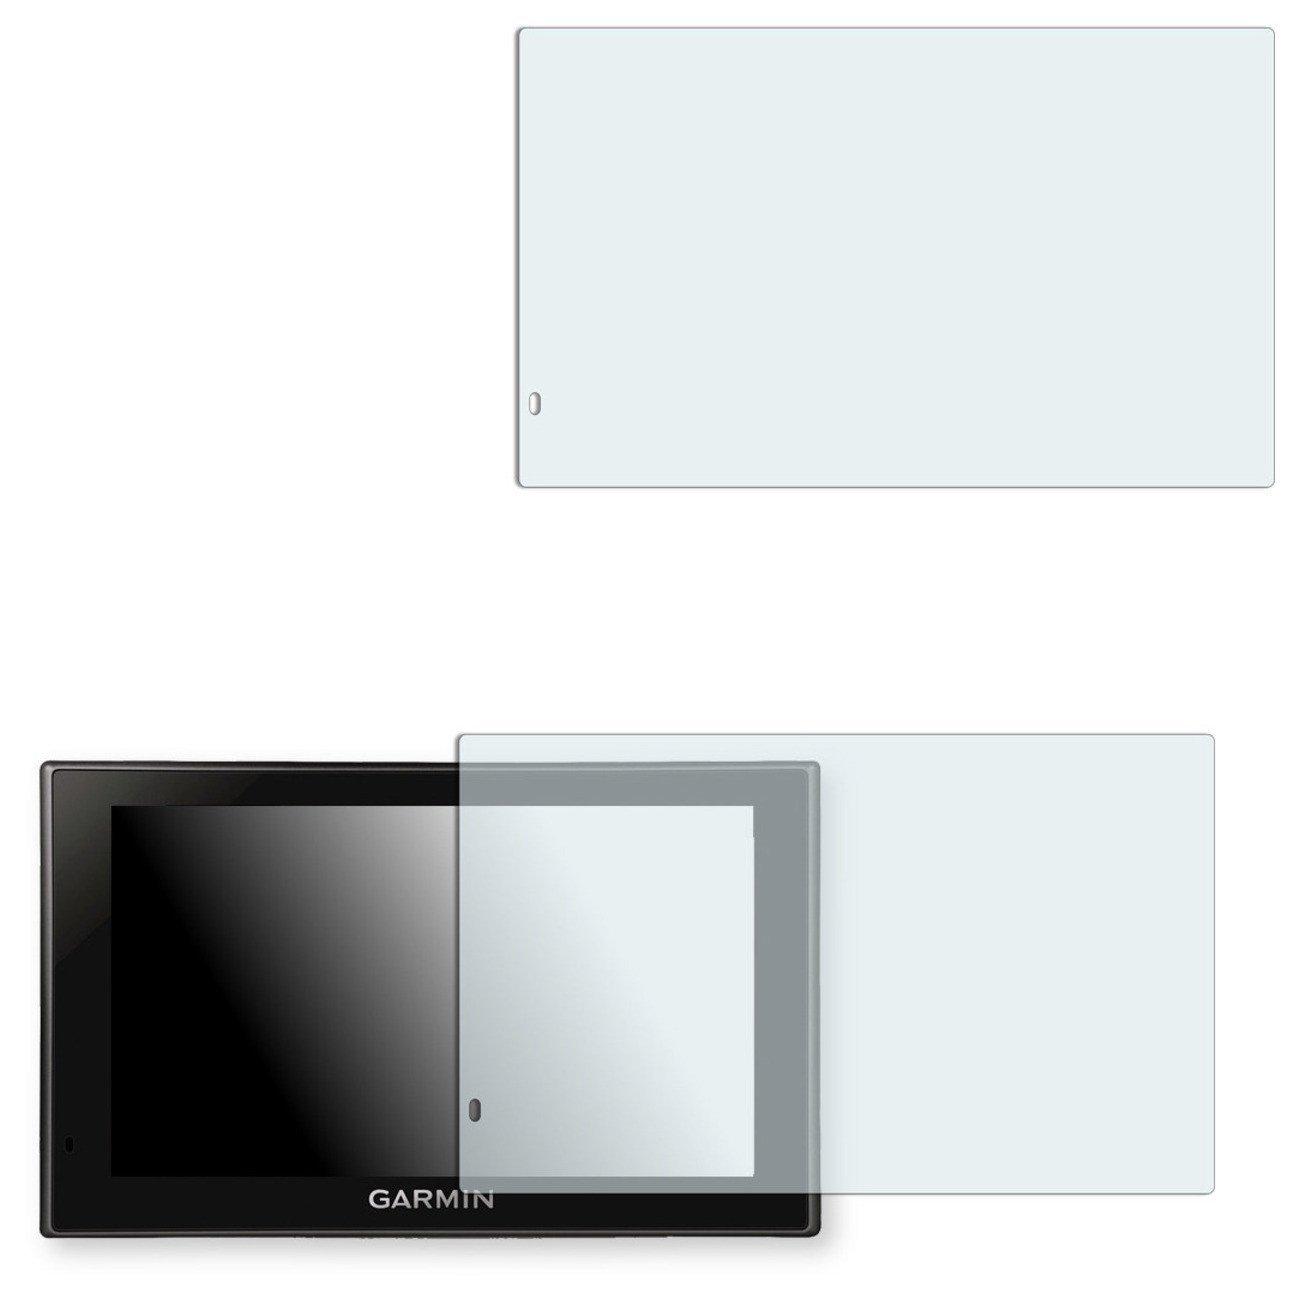 2x Golebo Anti-Glare screen protector for Garmin Camper 660 LMT (Anti-Reflex, Air pocket free application, Easy to remove)